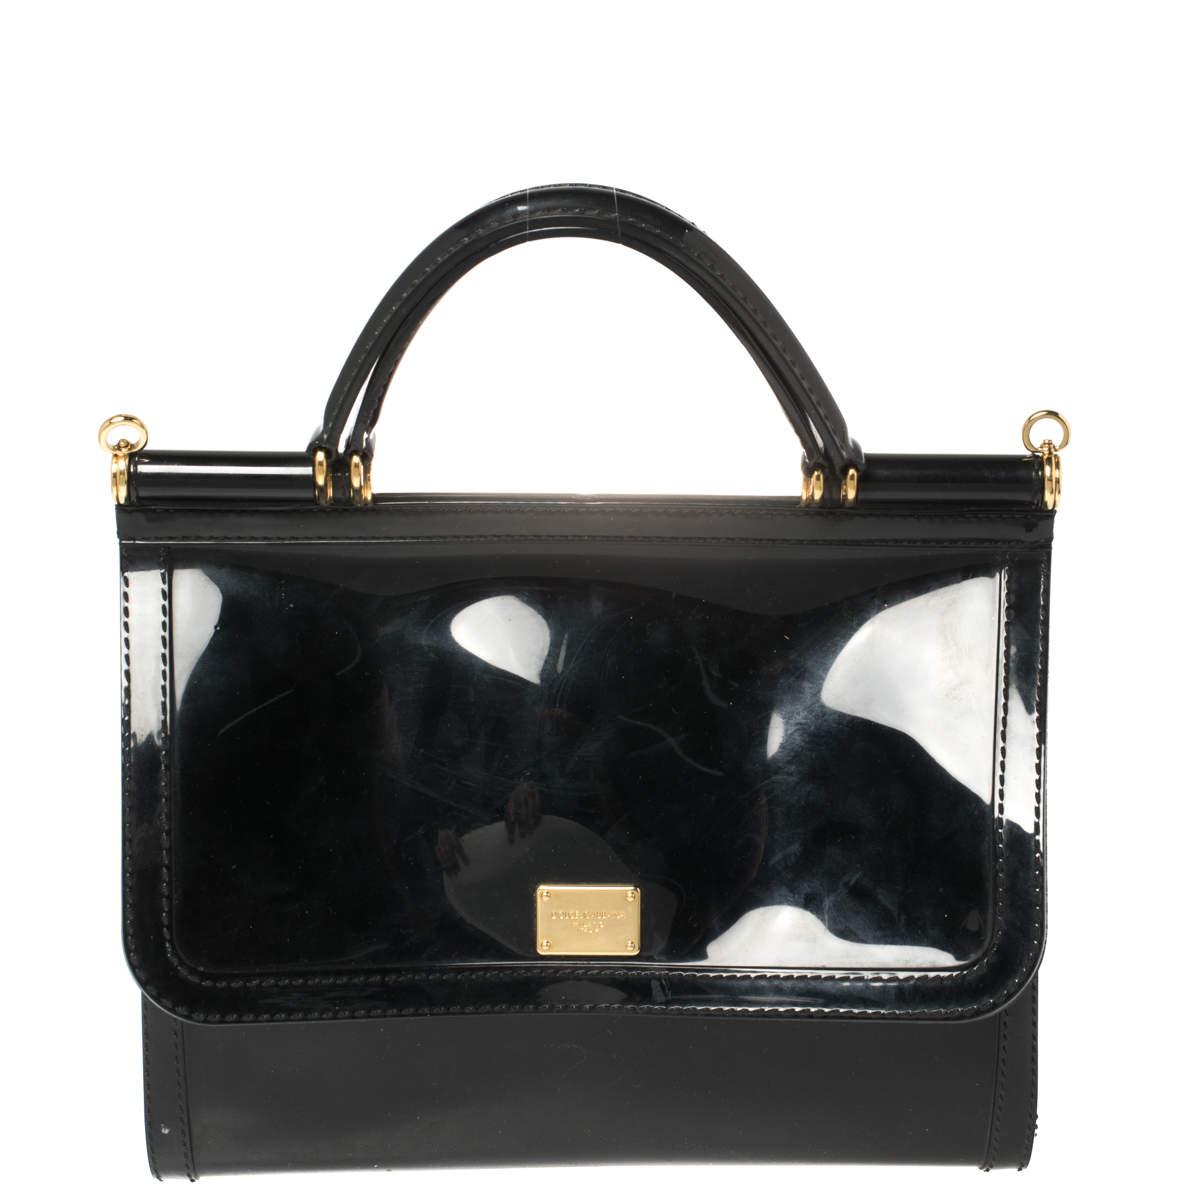 Dolce & Gabbana Black Rubber Small L'amore È Bellezza Miss Sicily Top Handle Bag